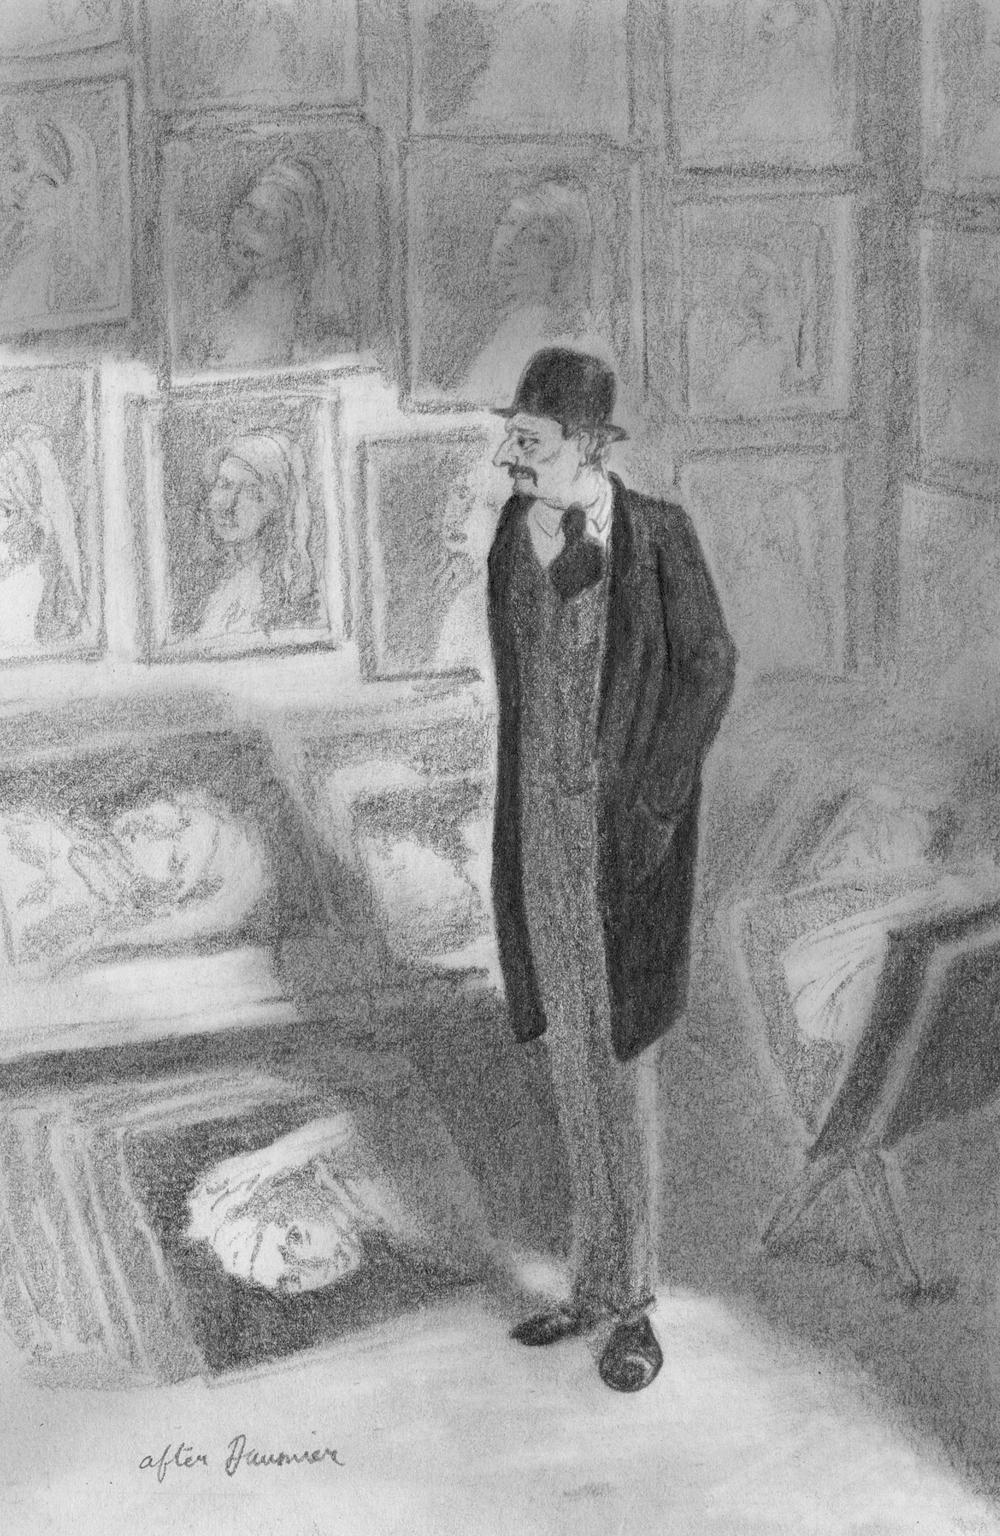 After Daumier Main.jpg